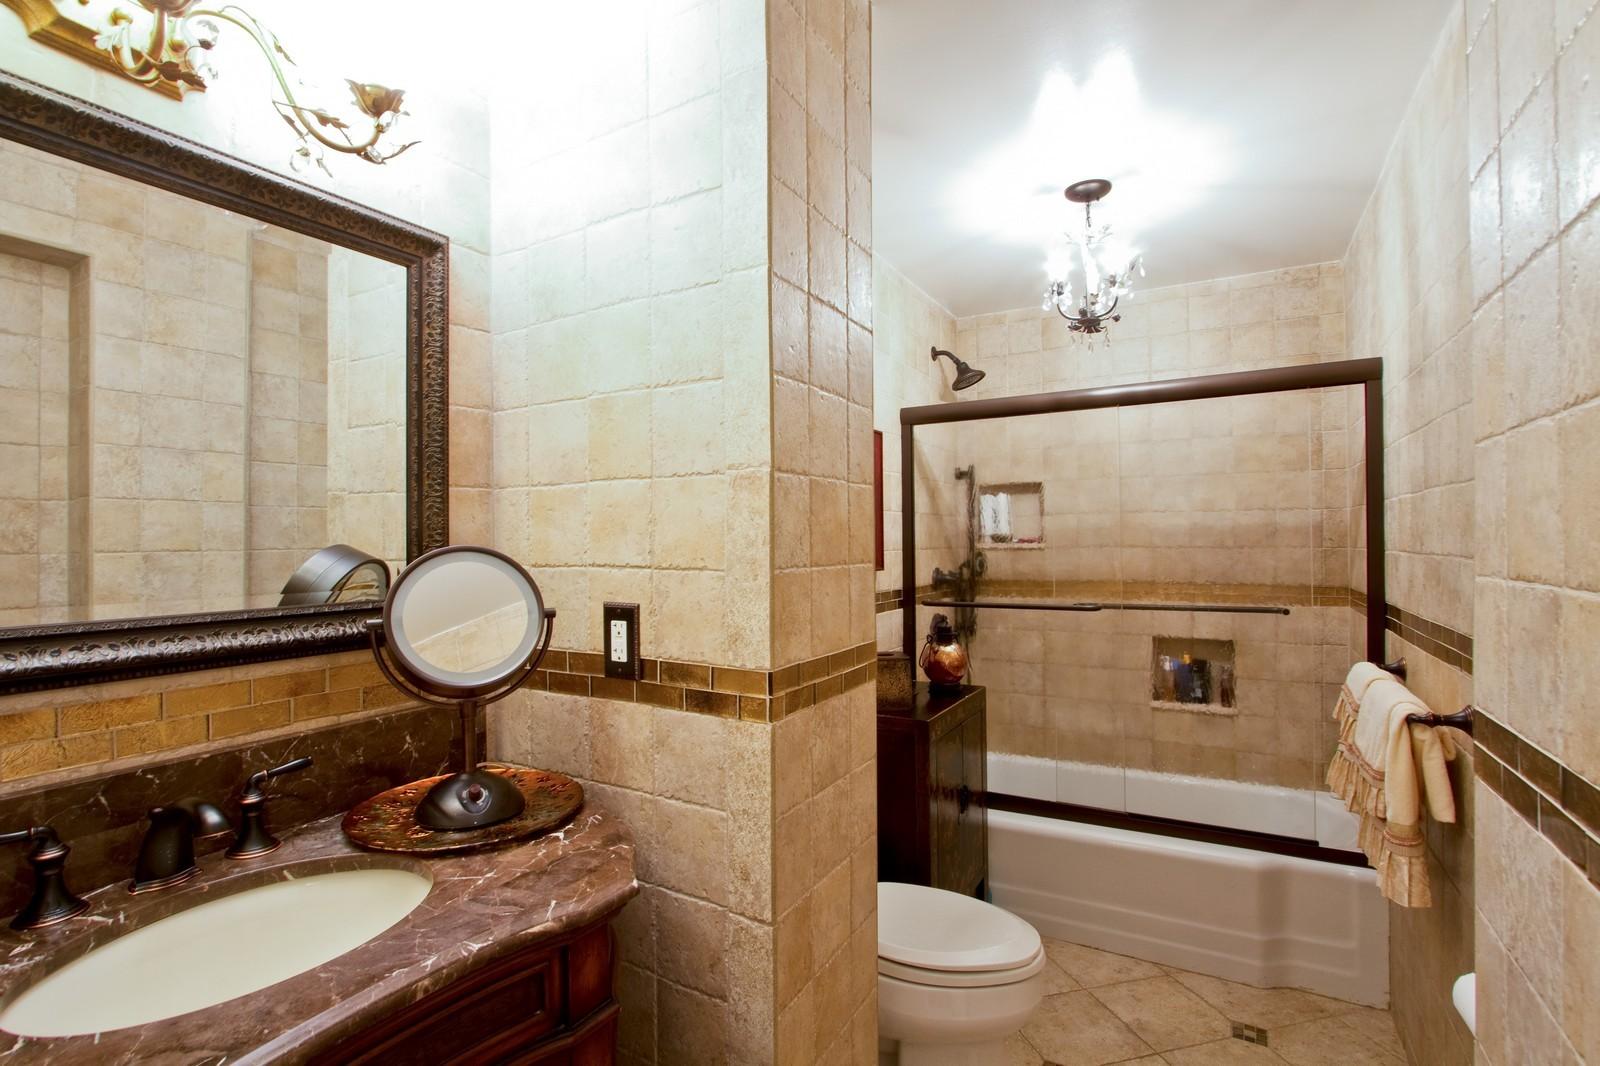 Real Estate Photography - 211-65 23rd Avenue, Unit 3D, Bayside, NY, 11360 - Bathroom